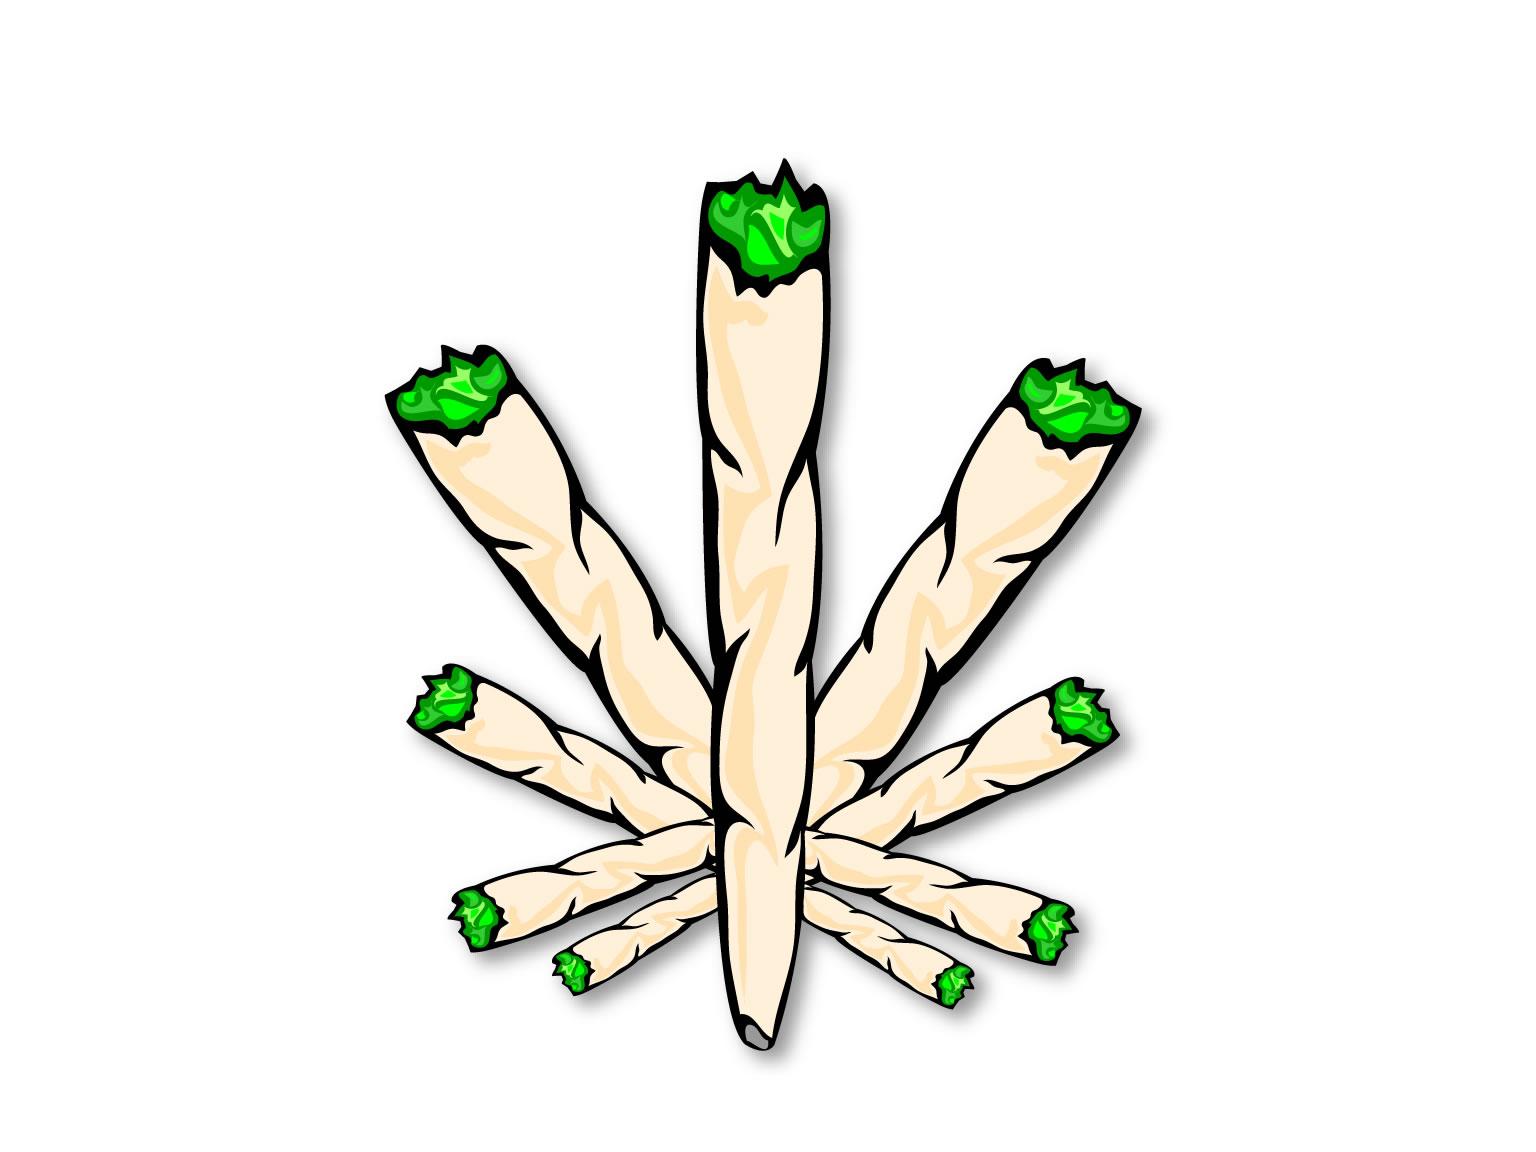 foto de Free Dibujos De Marihuana Download Free Clip Art Free Clip Art on Clipart Library